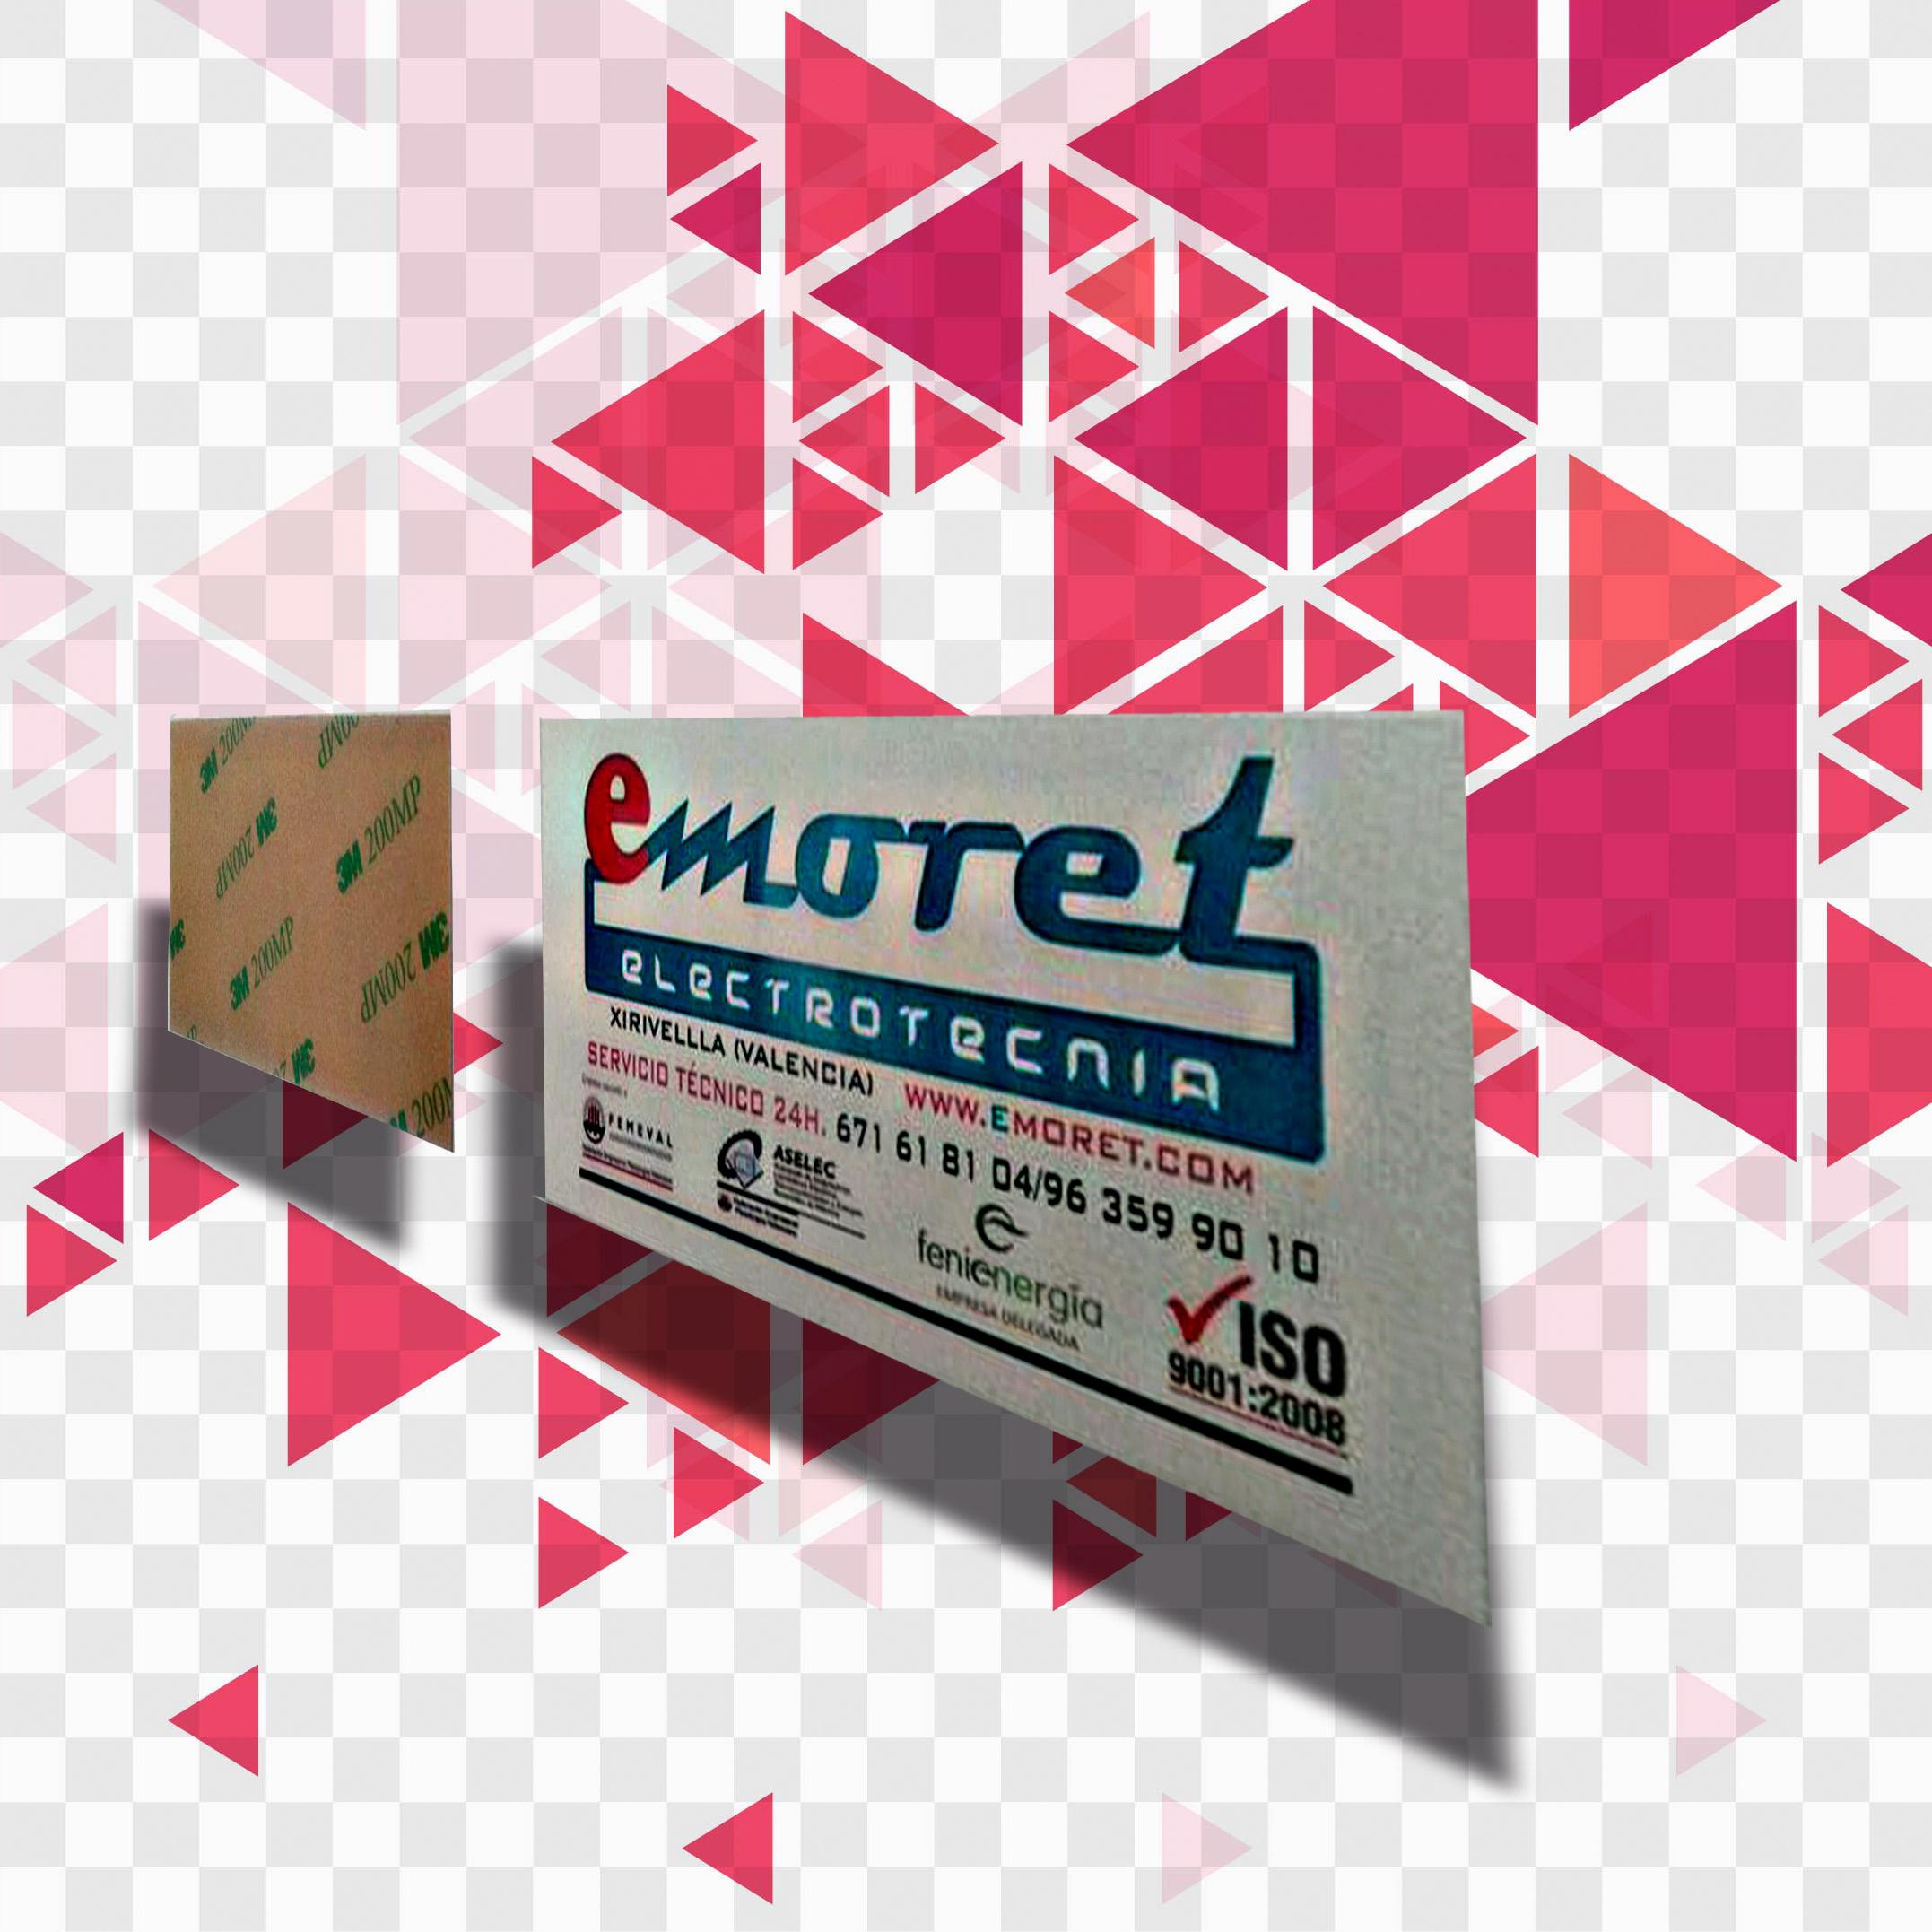 etiquetas pvc impreso adhesivo